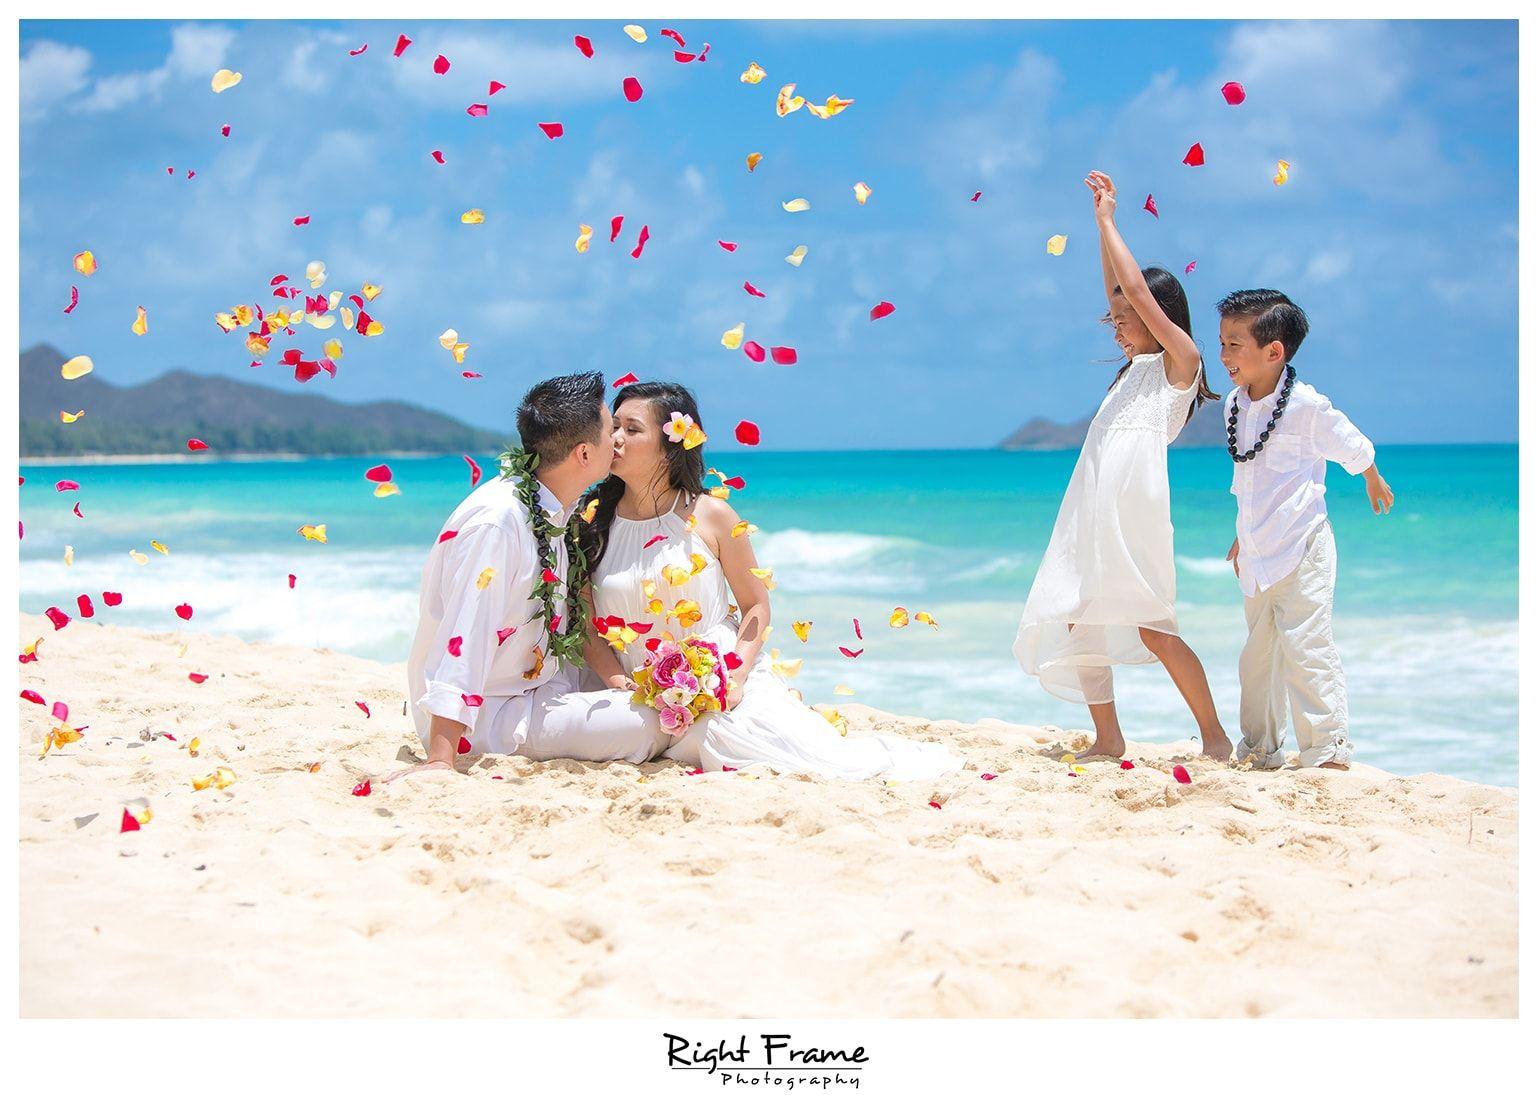 Beach Vow Renewal Ceremony: Www.rightframephotography.com